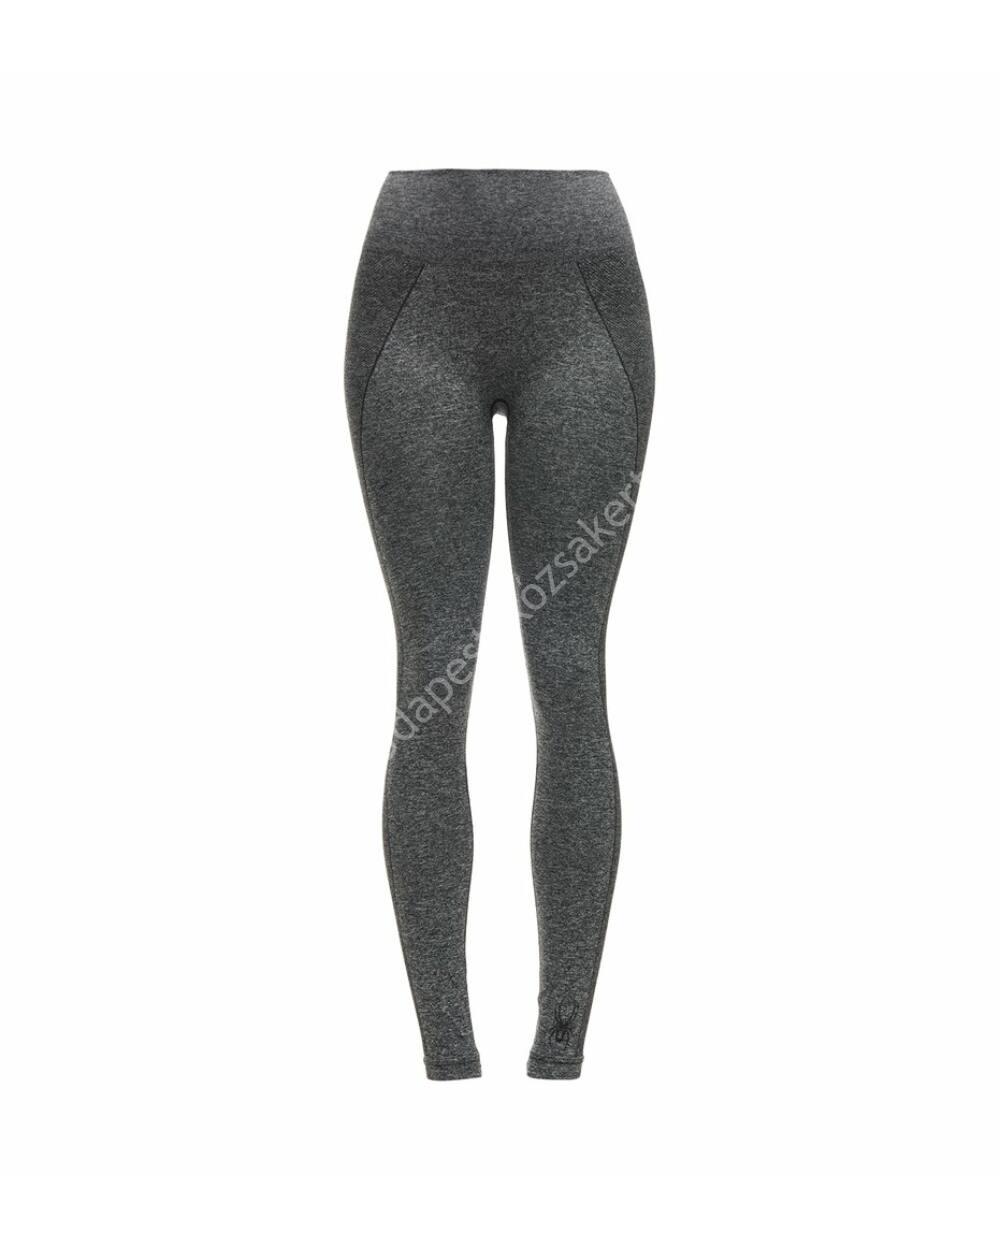 Spyder Runner női aláöltöző nadrág, szürke, XS/S